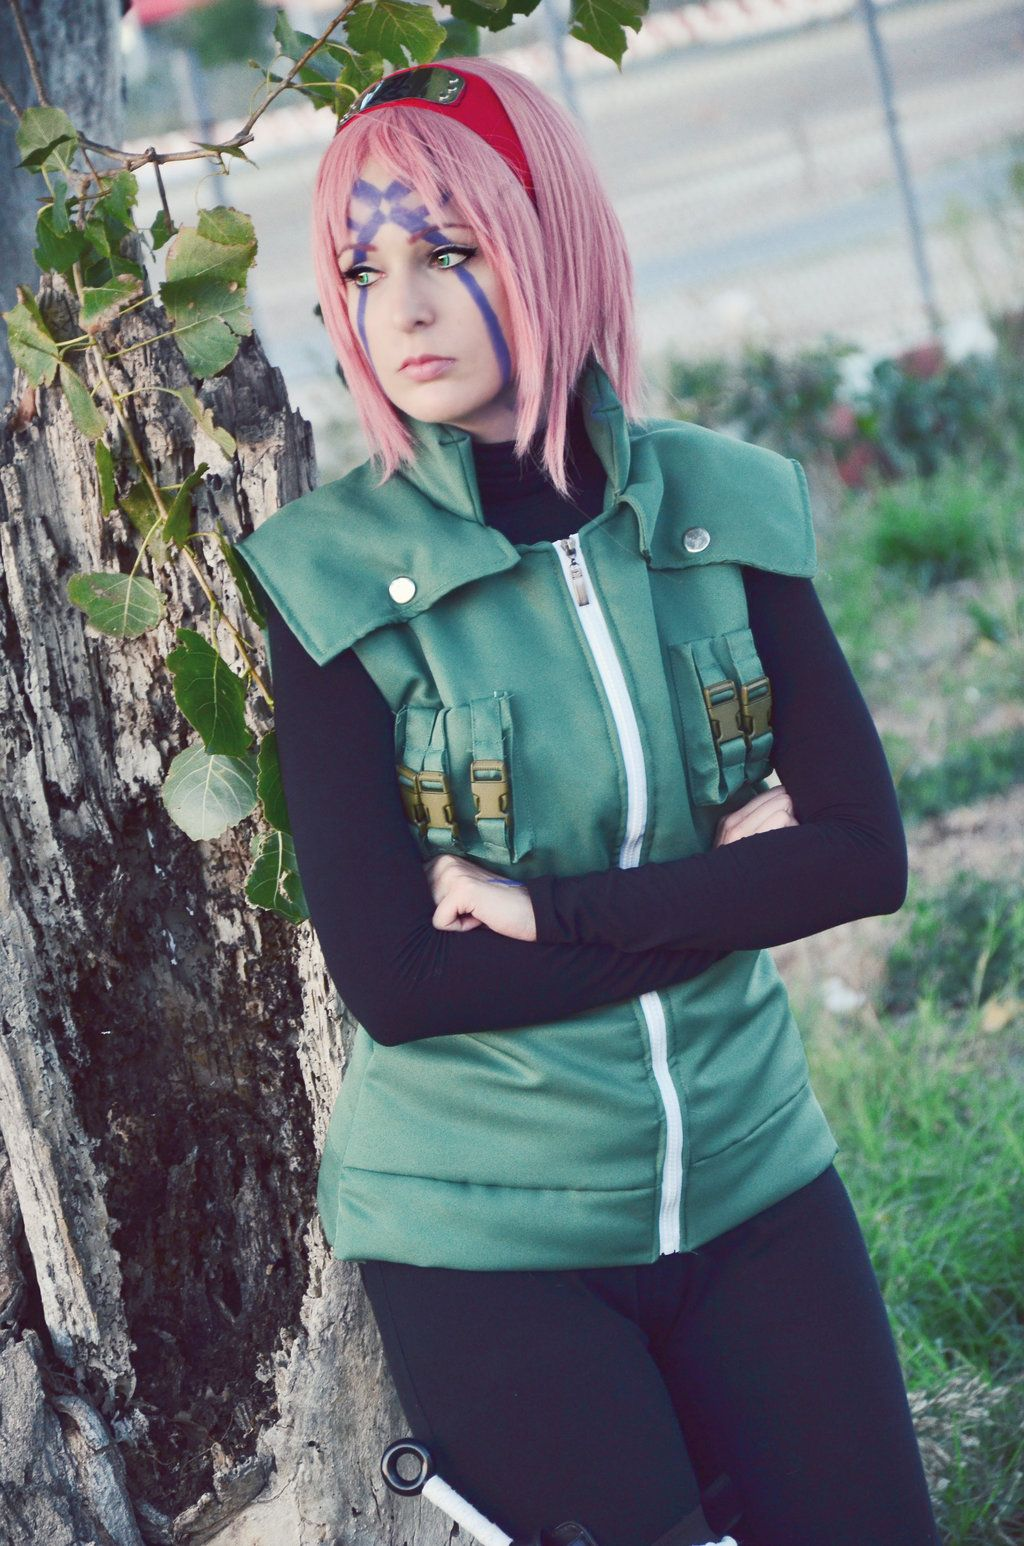 Sakura Haruno. Shinobi War cosplay by SakuraBlossom94 on